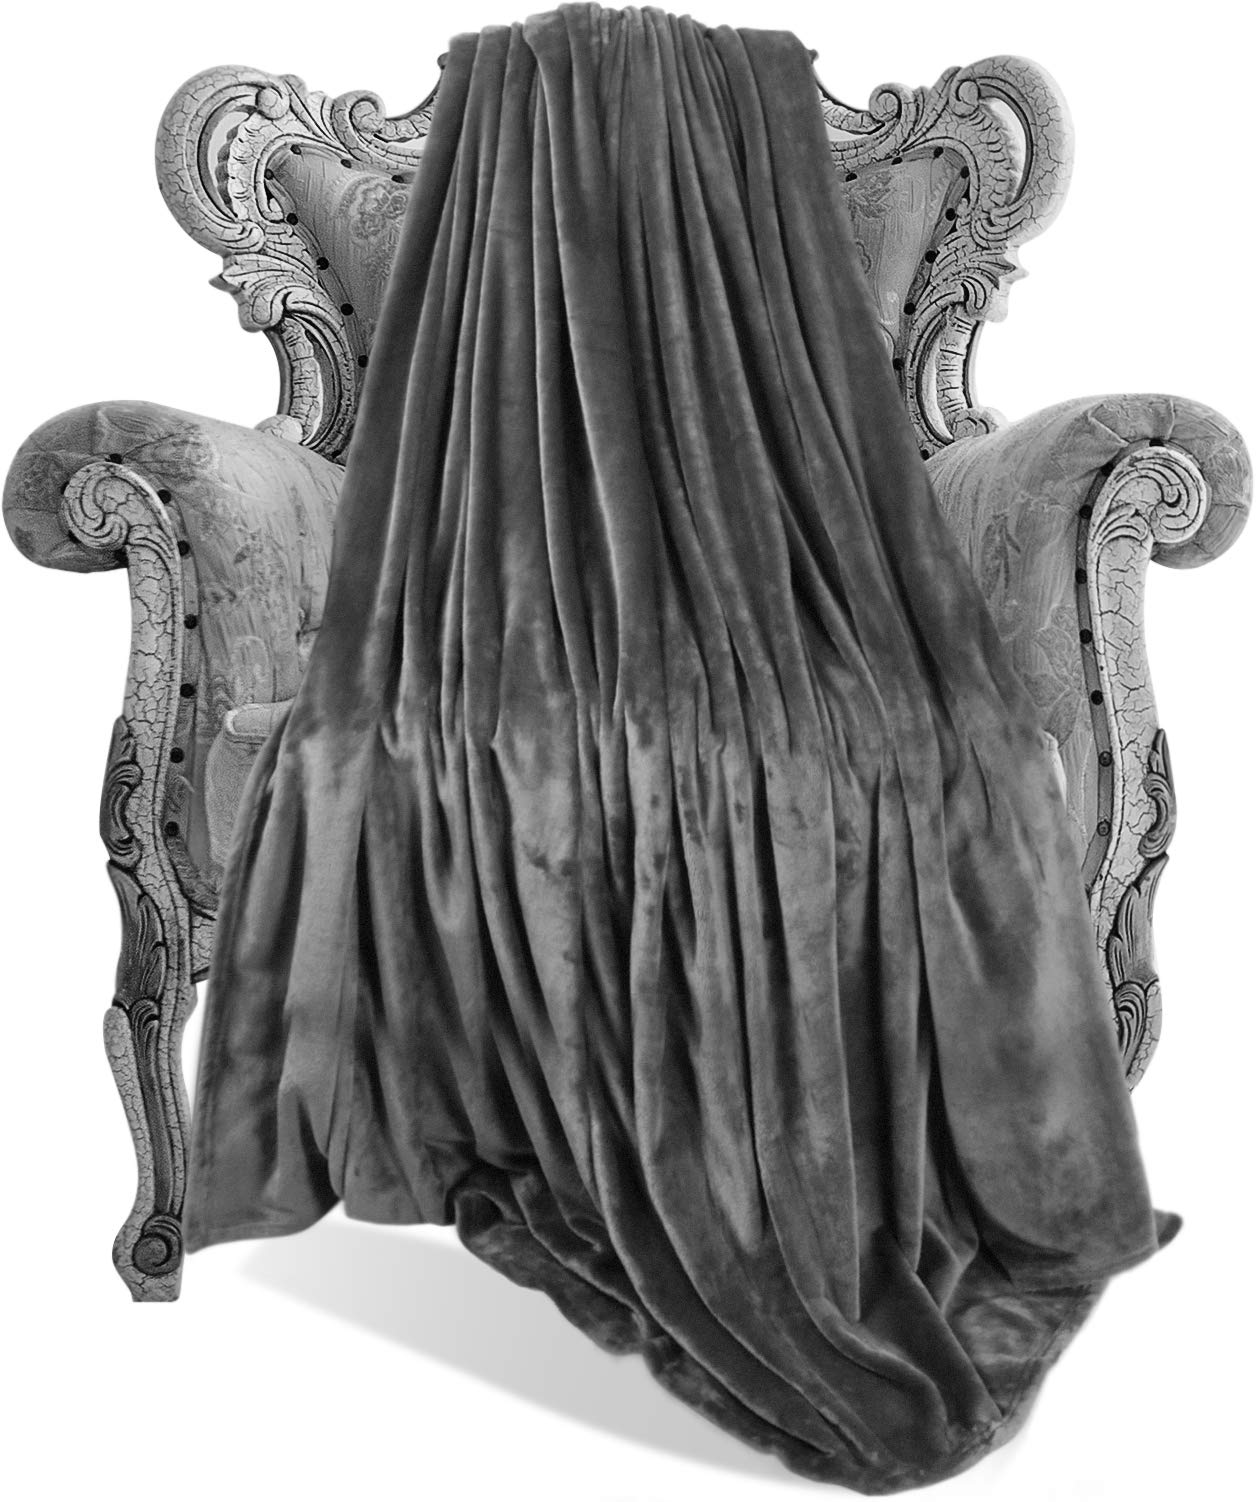 Utopia Bedding Flannel Fleece Blanket (Grey, King) Plush Microfiber Fabric- lightweight & warm Couch/Bed Blanket– Easy Care